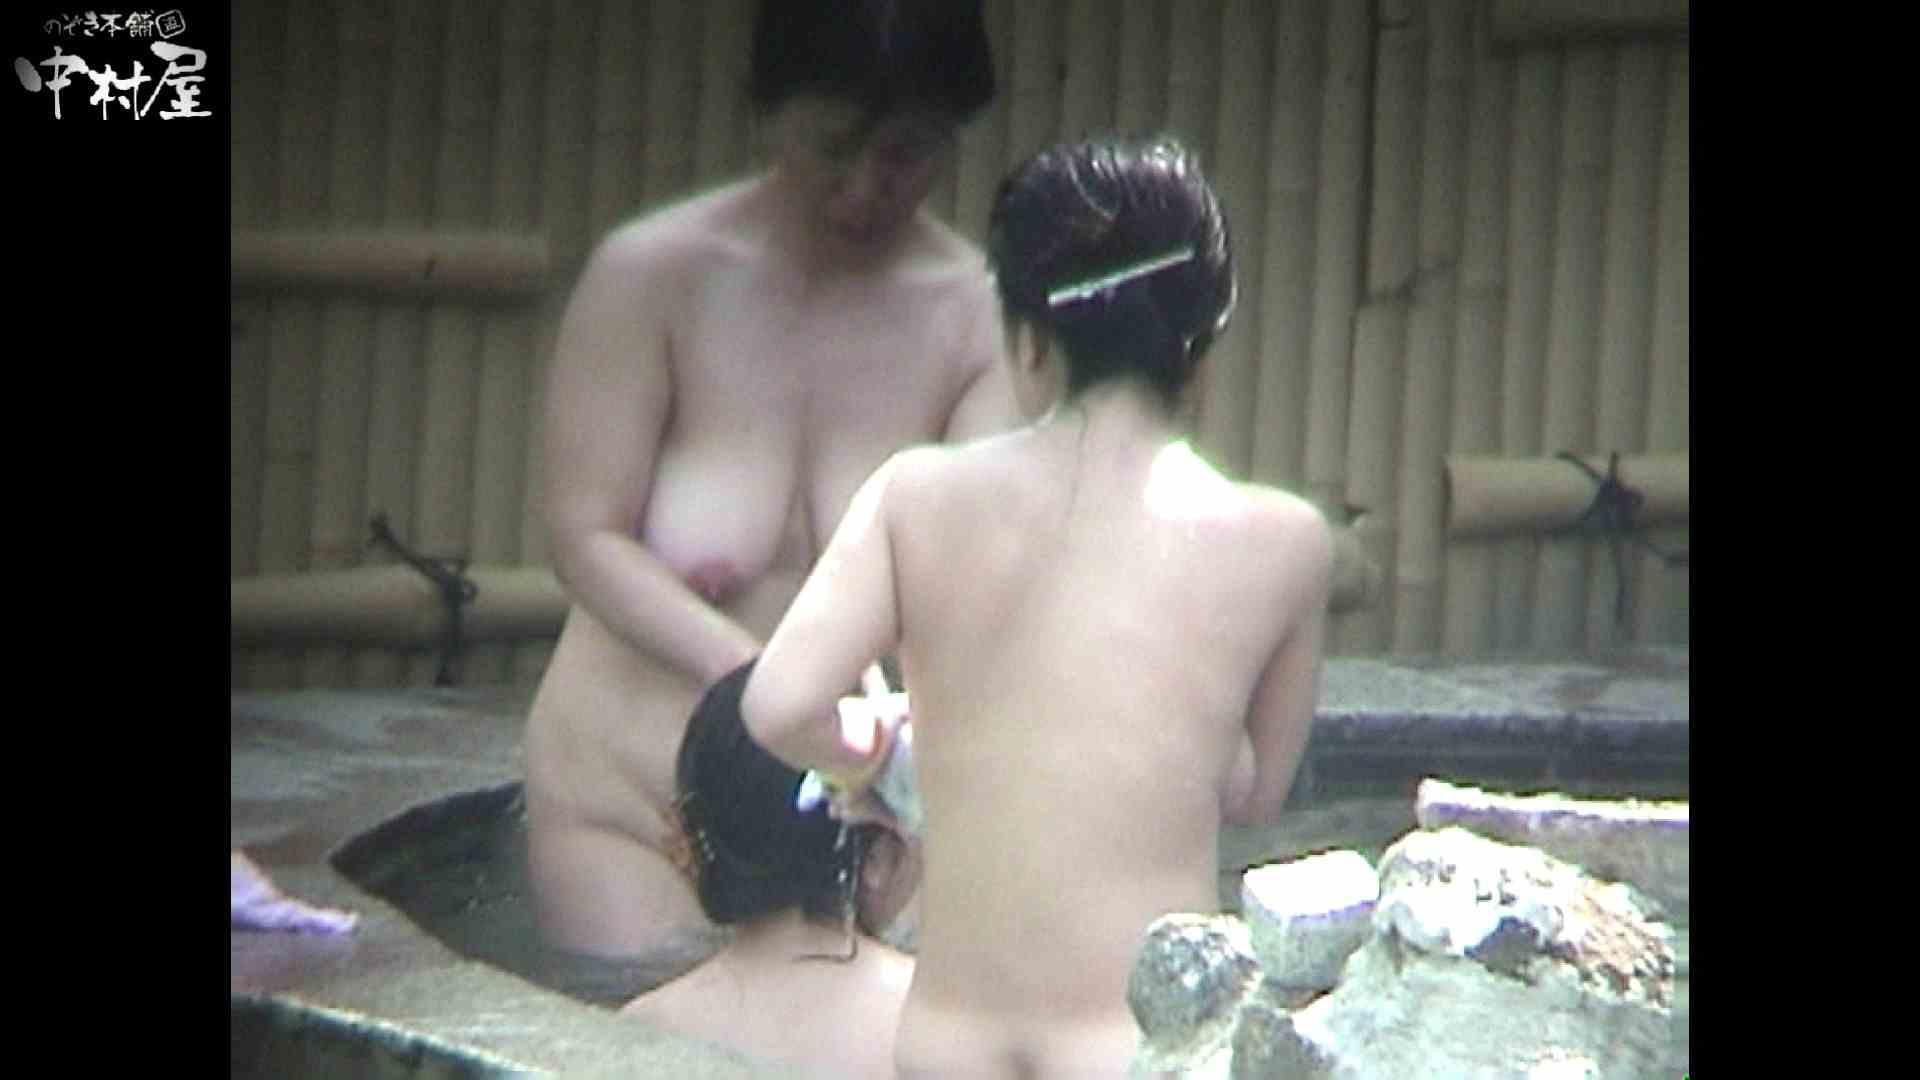 Aquaな露天風呂Vol.936 OLセックス 覗きぱこり動画紹介 75画像 68